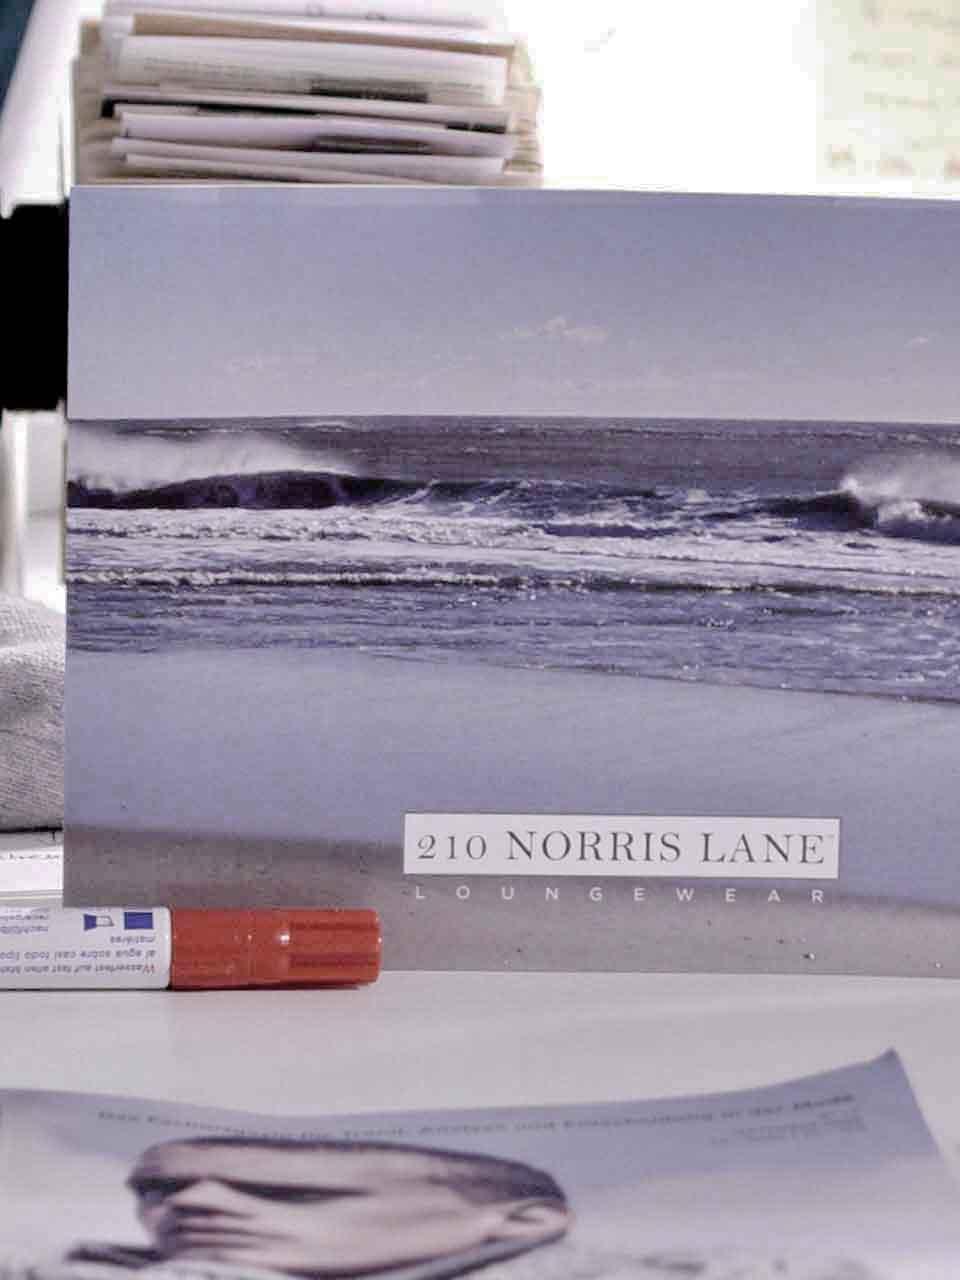 uli trautmann 210 norrislane fashion label